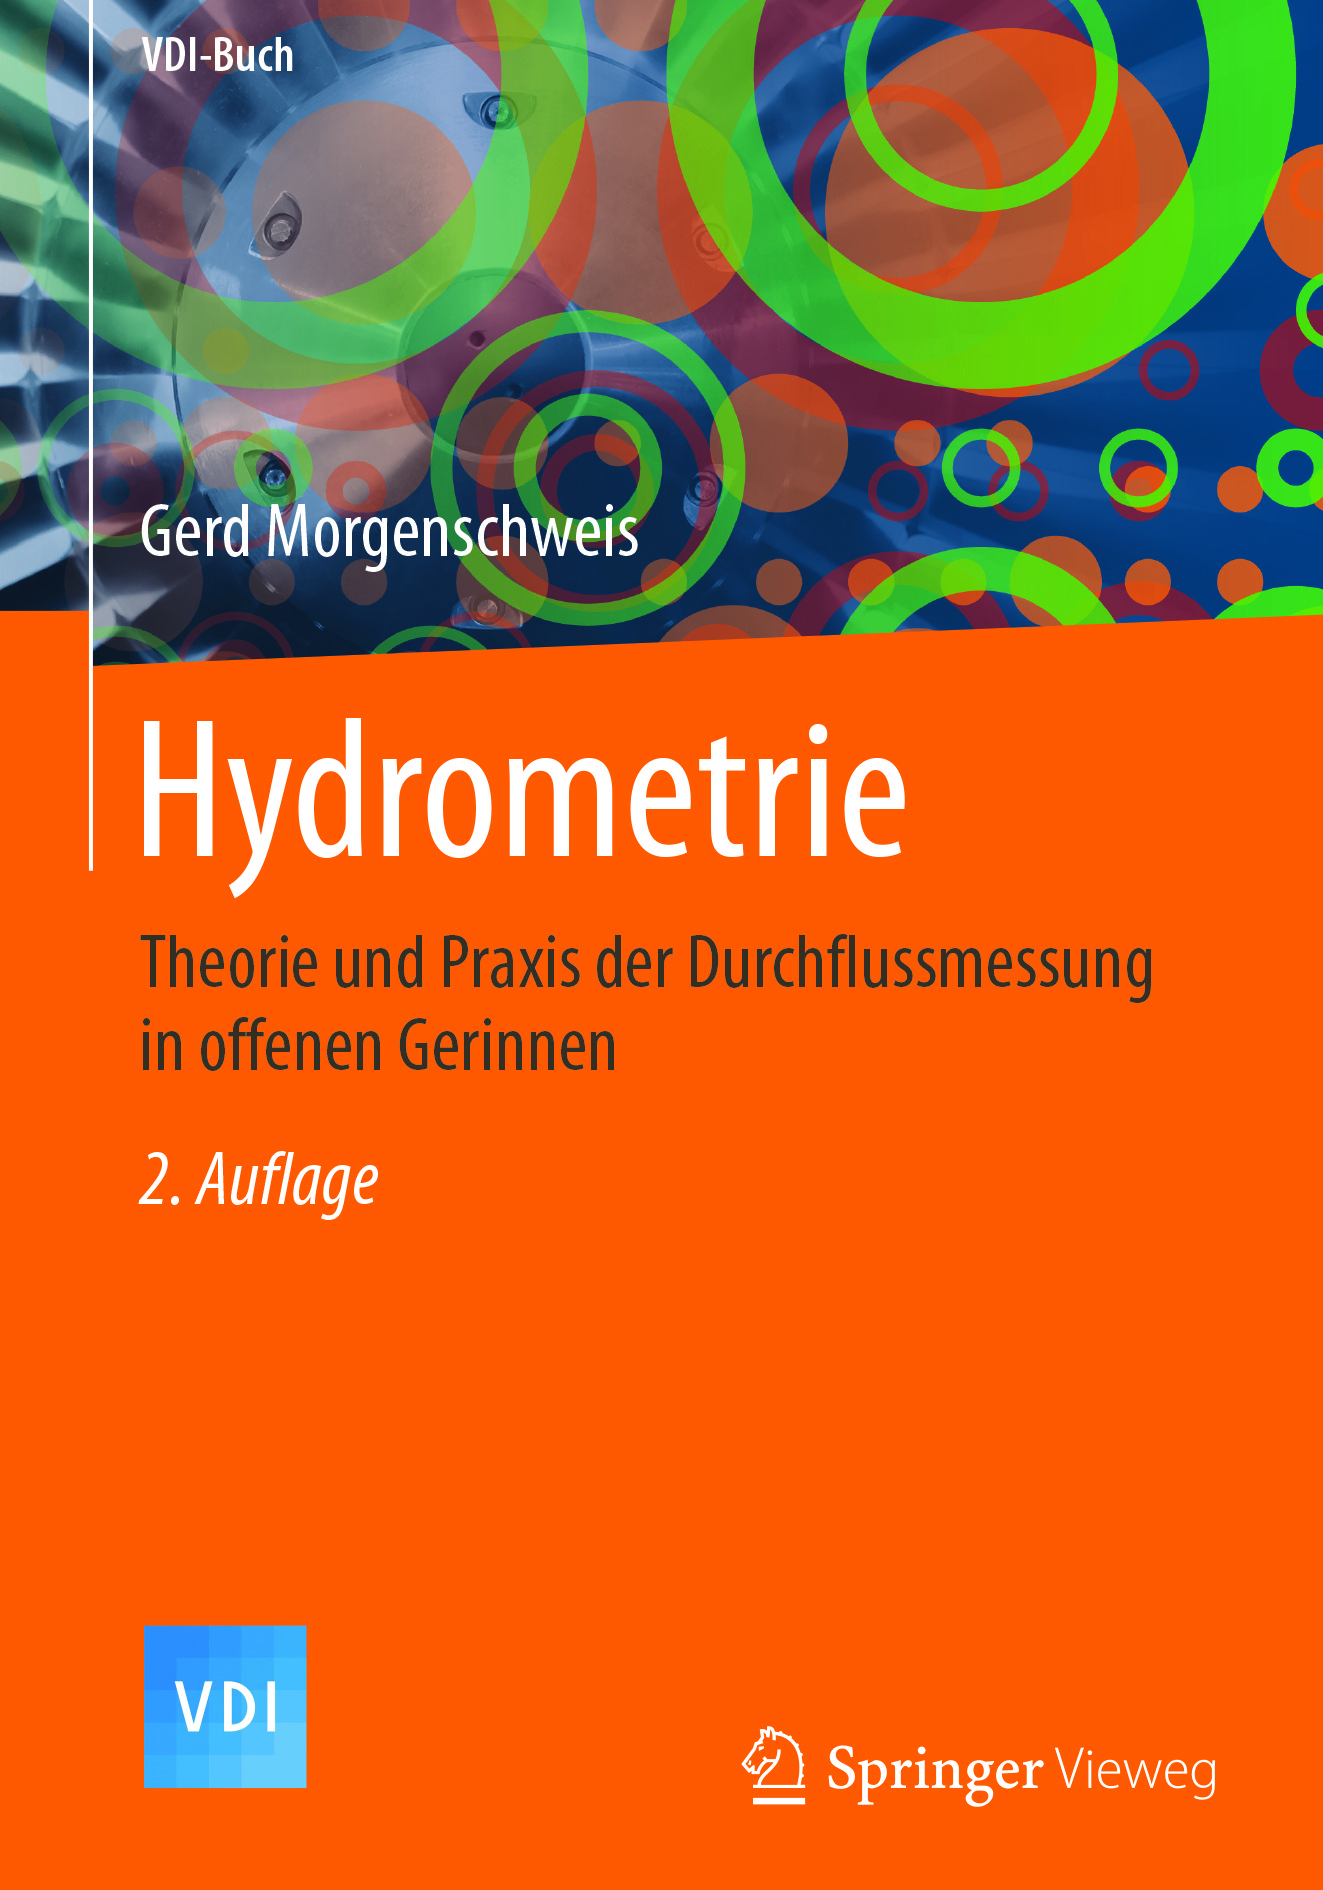 Morgenschweis, Gerd - Hydrometrie, ebook